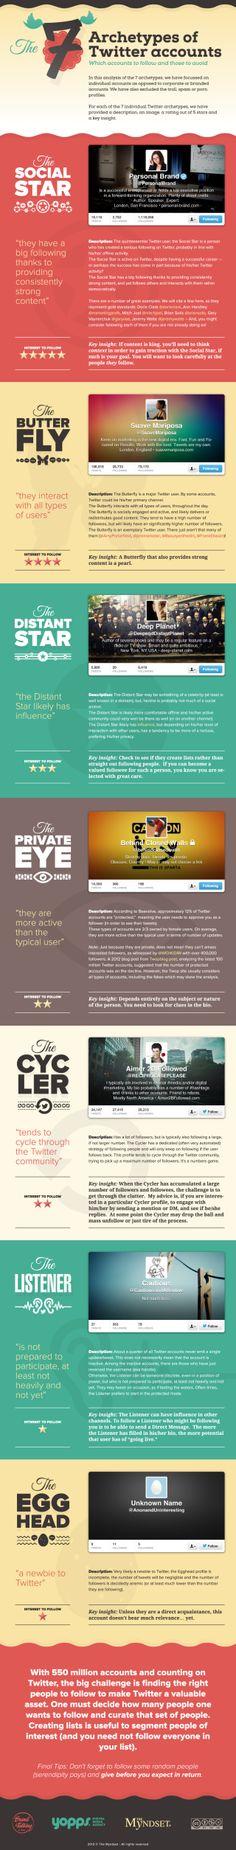 7 Archetypes of Twitter accounts #infografia #infographic #socialmedia